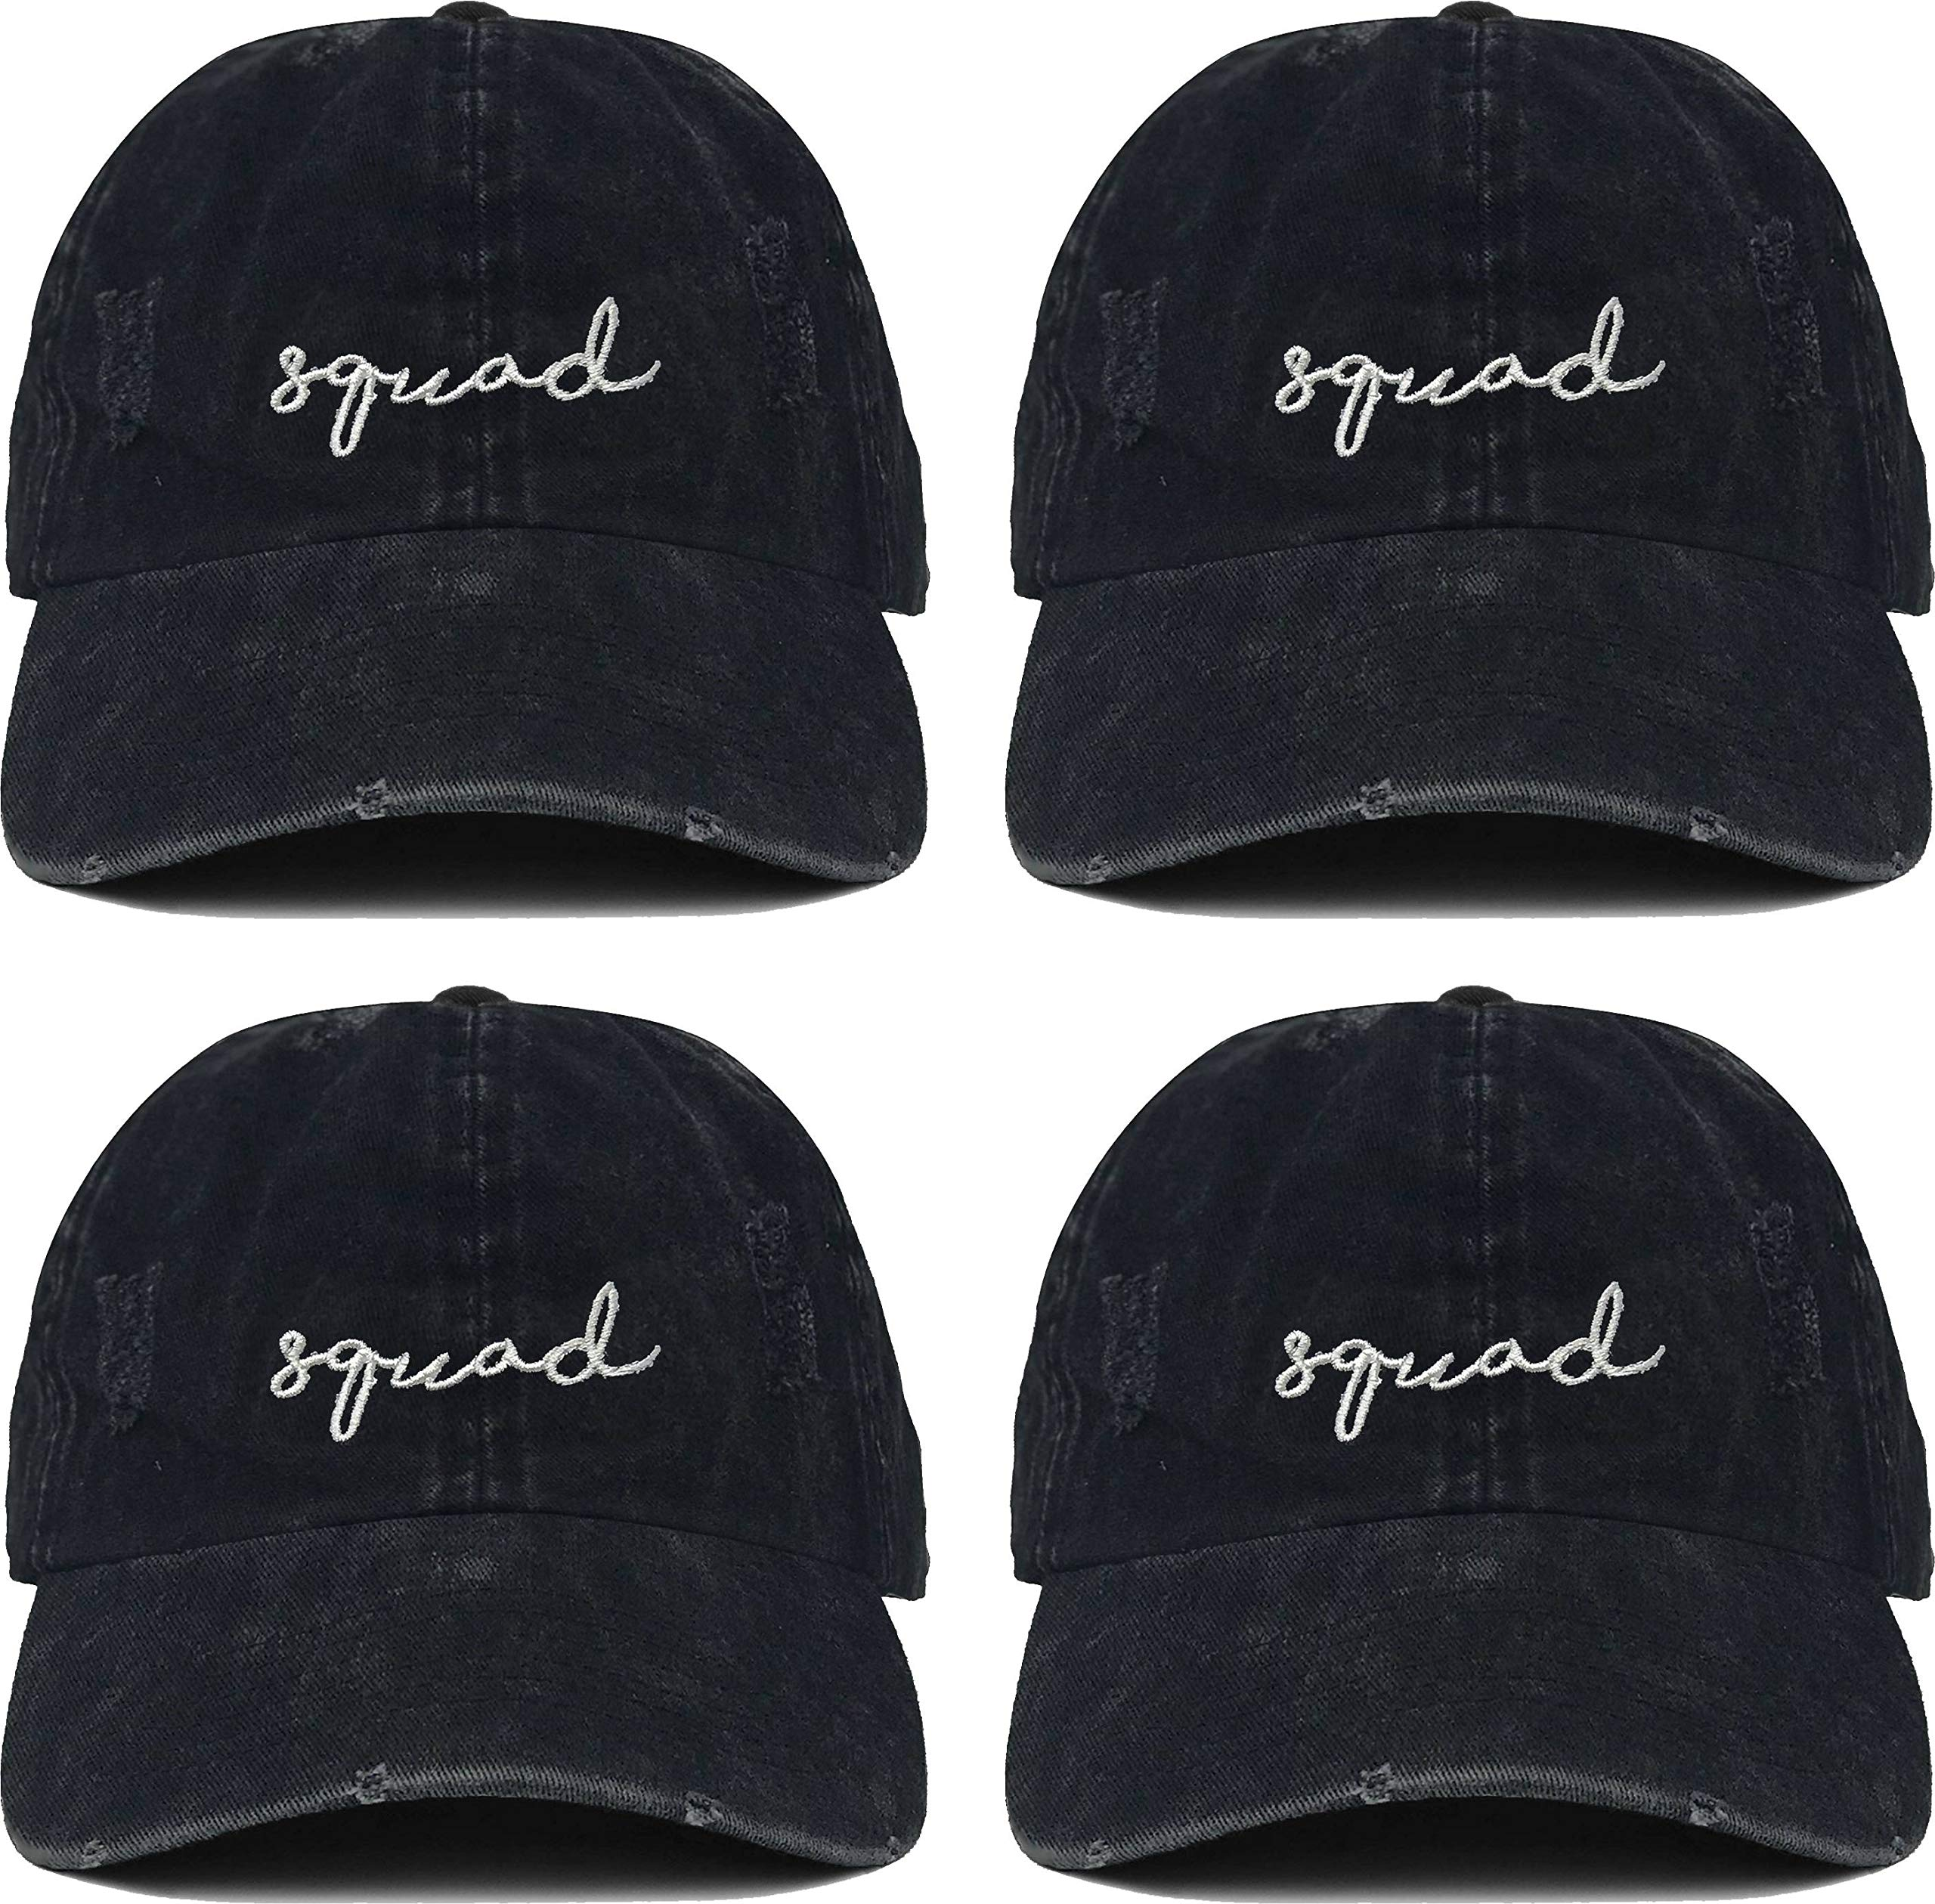 H-214-4-SQUAD06 Bridal Dad Hat Bundle: 4 Squad